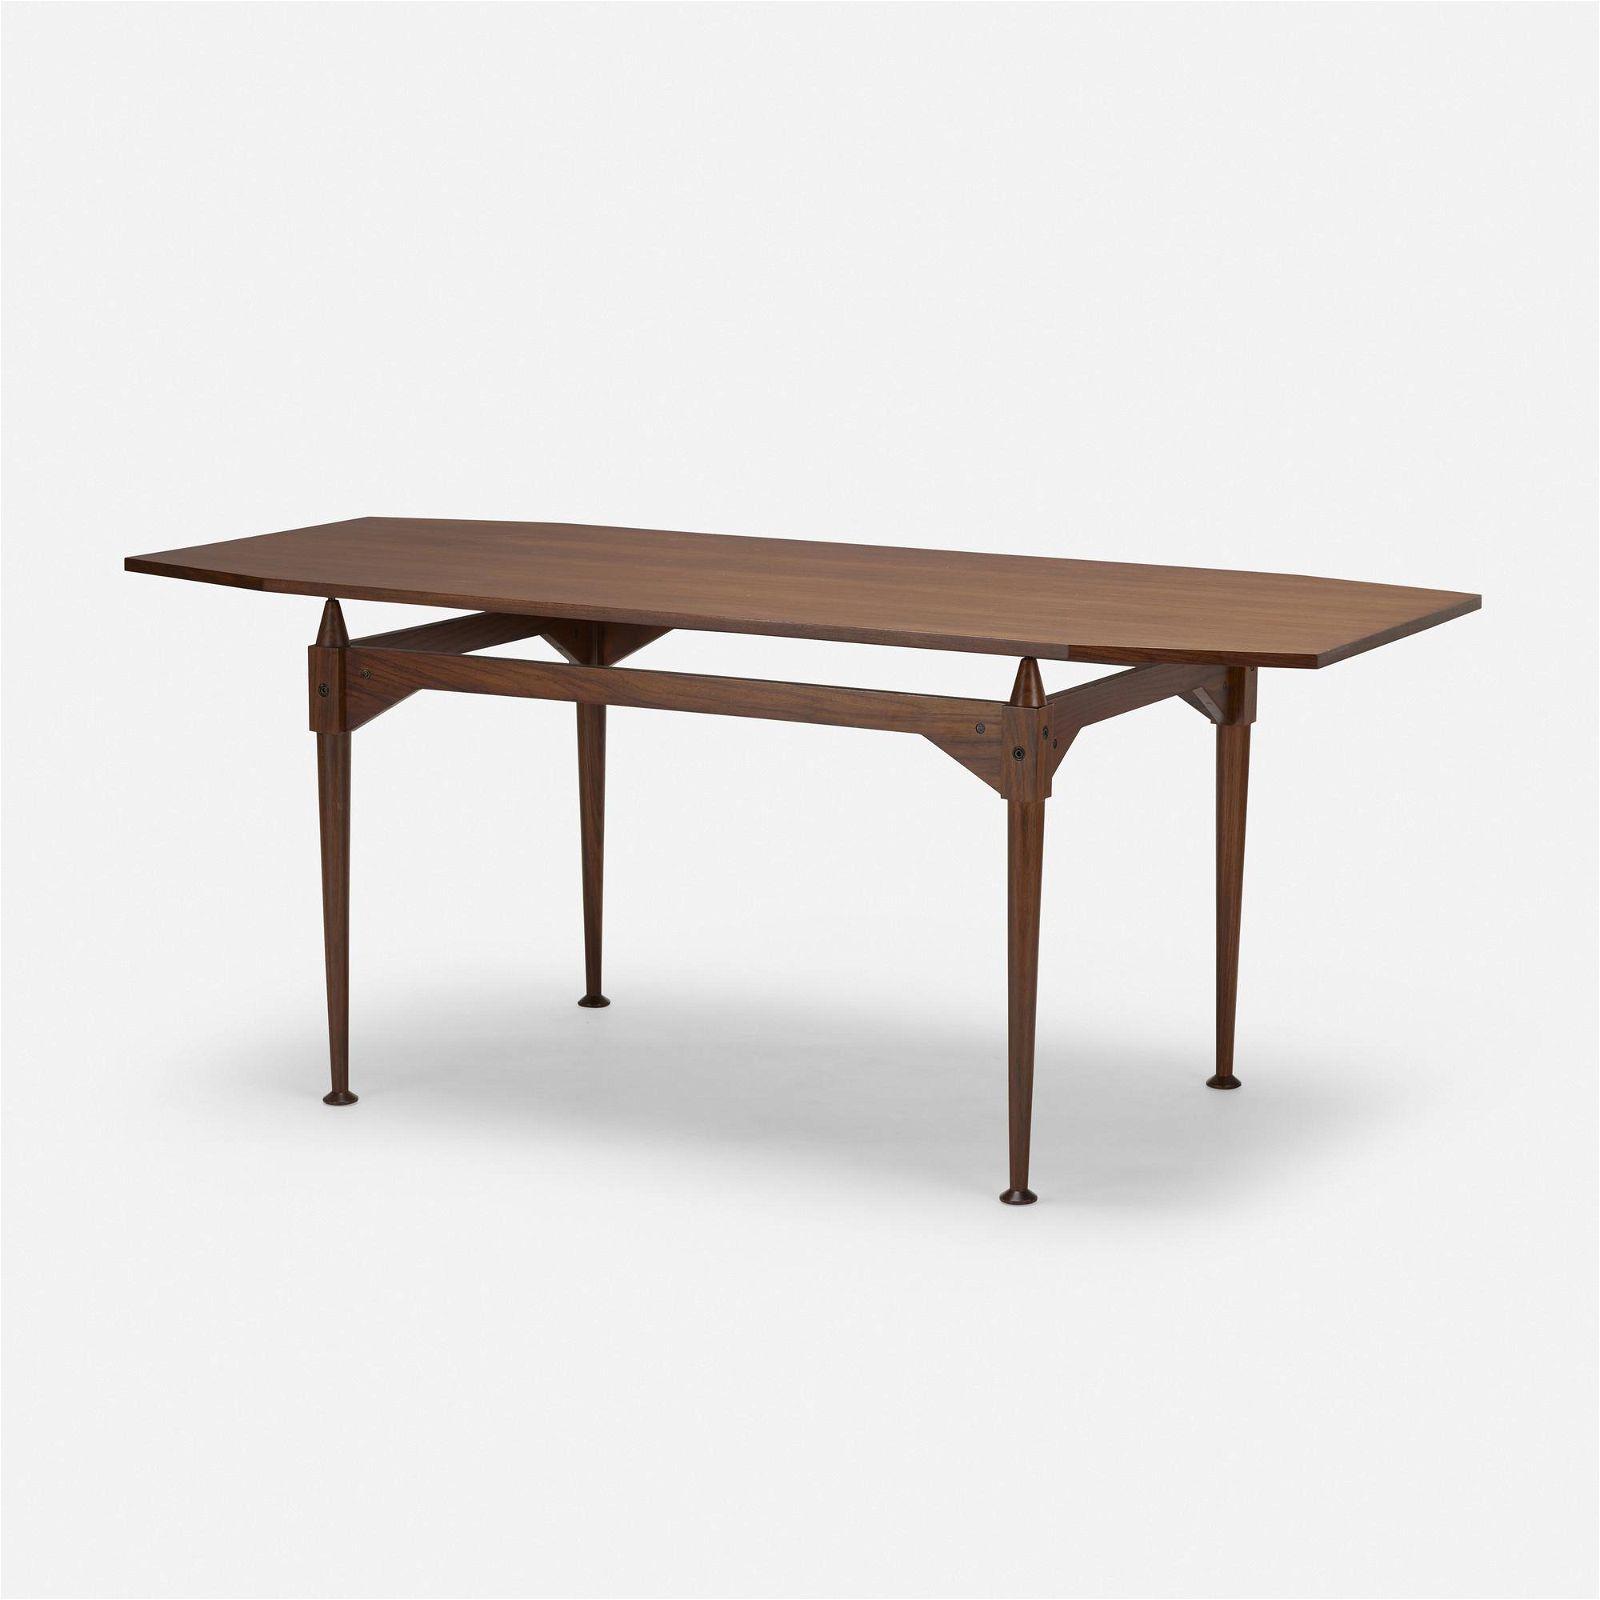 Franco Albini, Dining table, model TL3